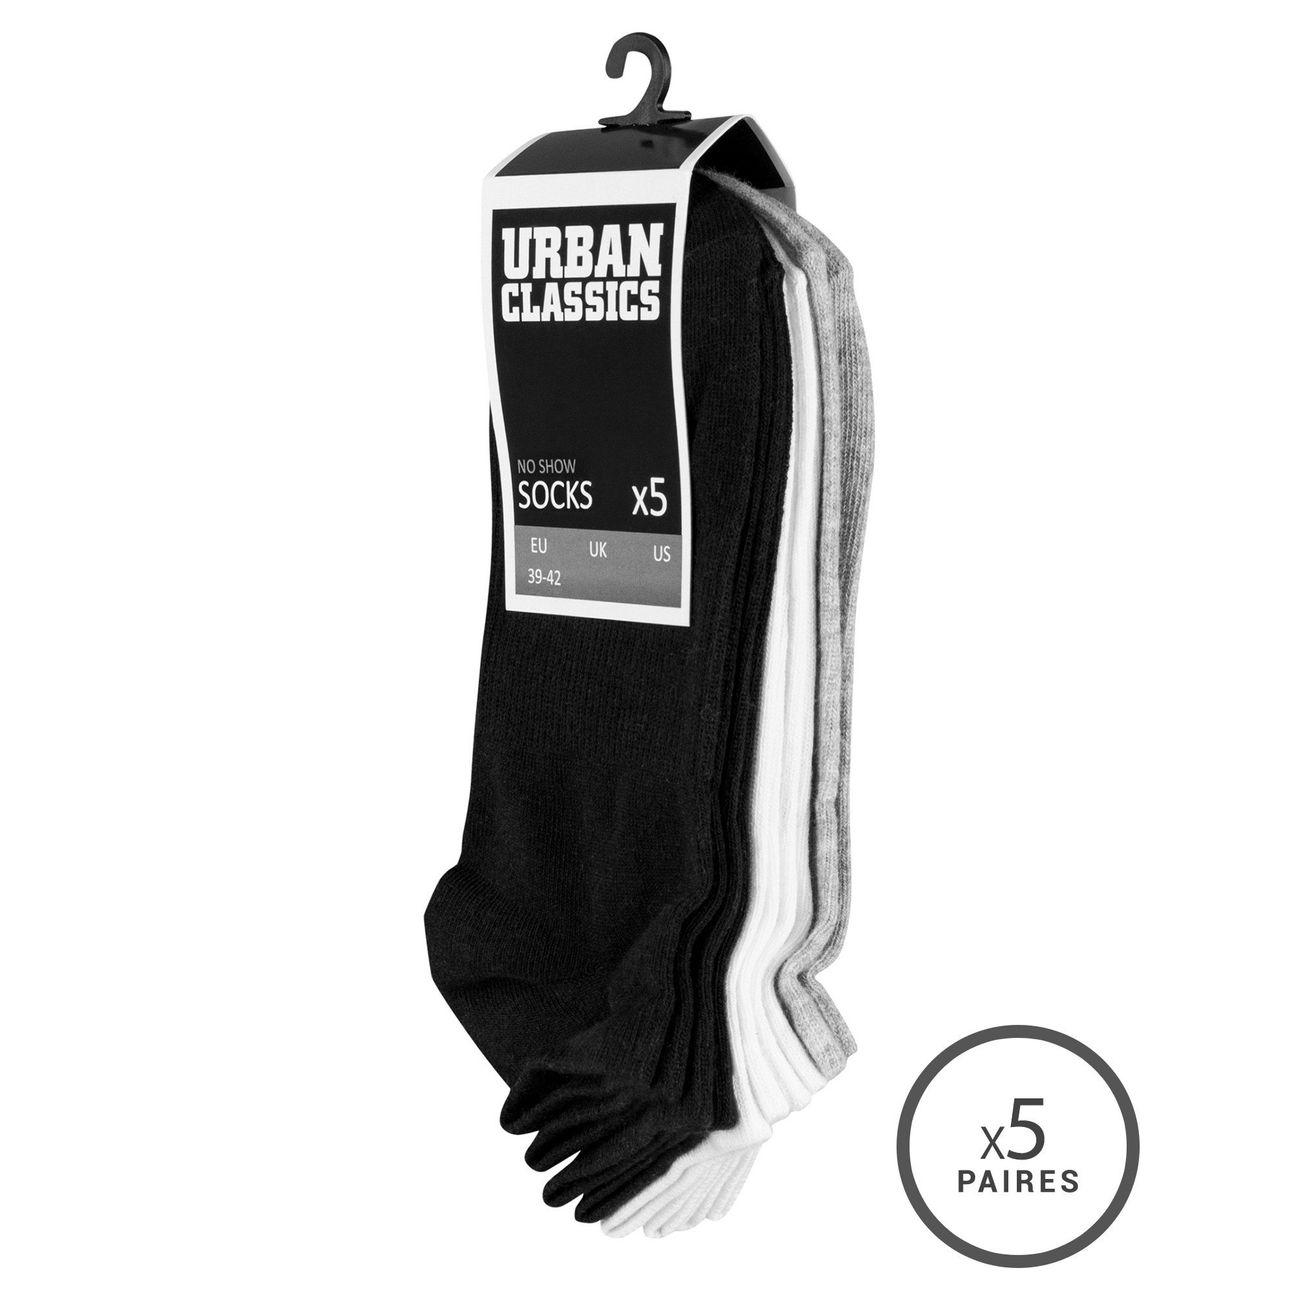 Urban Classics Socquettes Homme